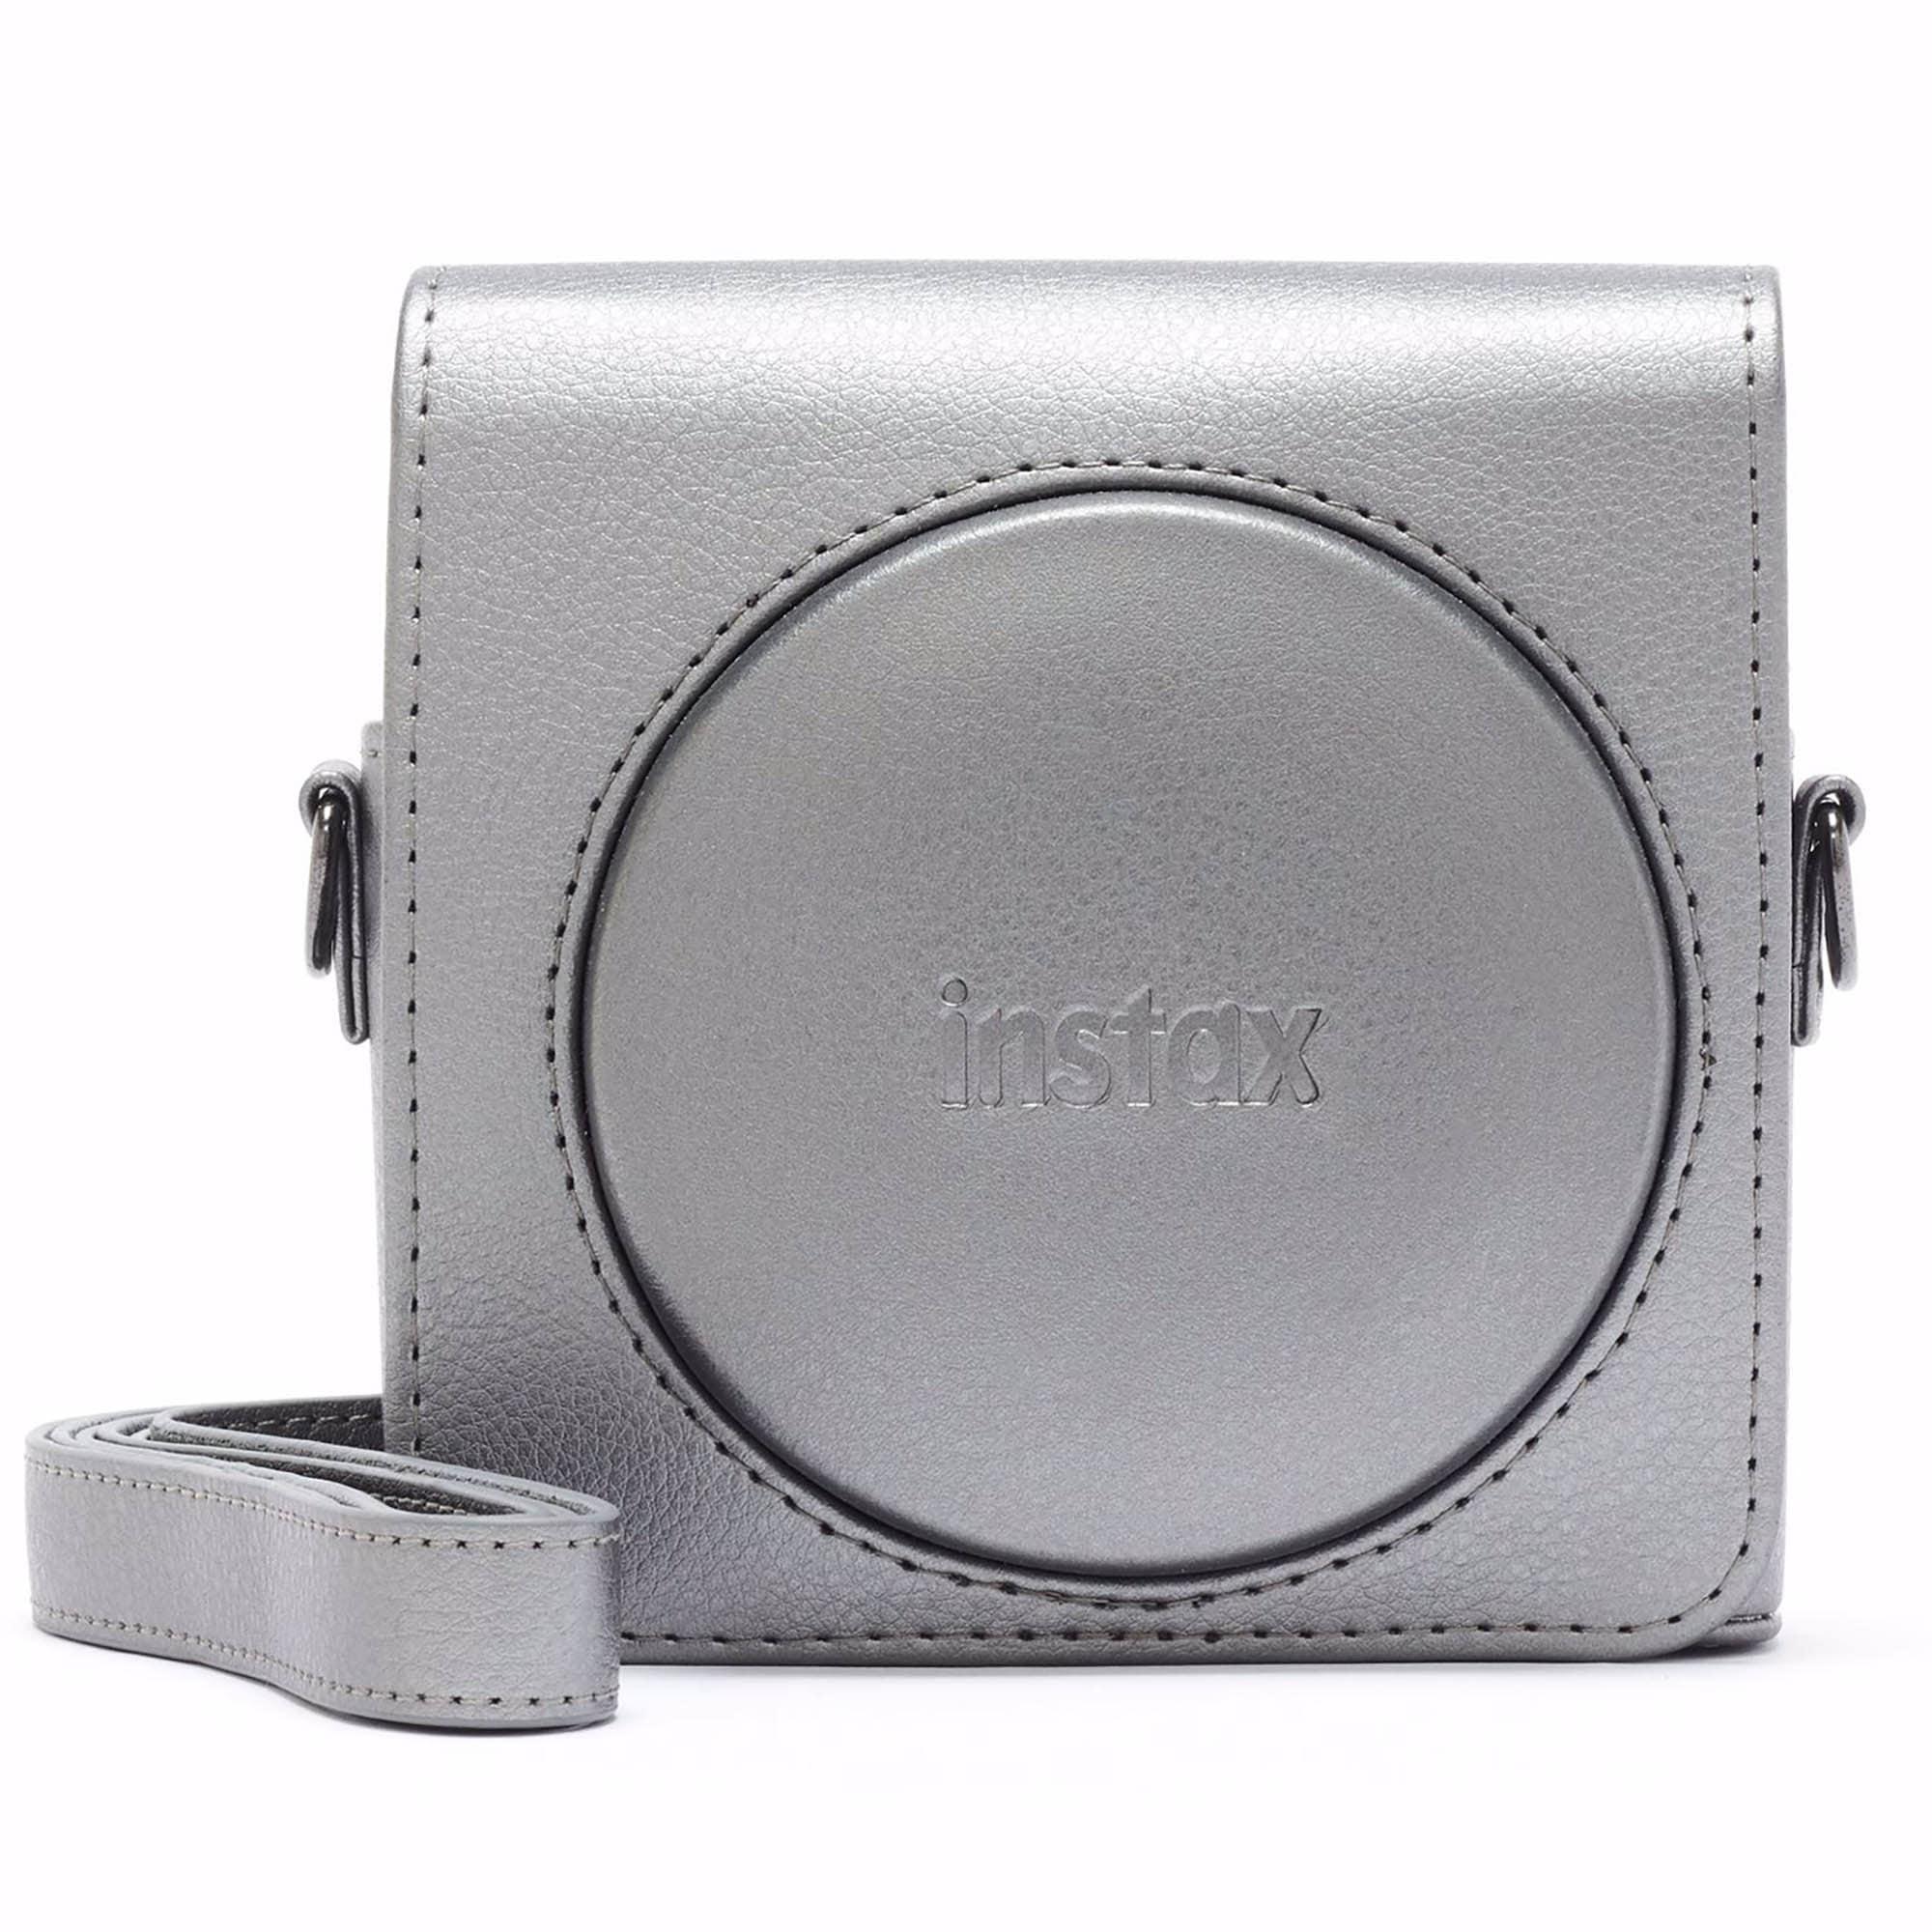 Fujifilm Instax Square 6 Väska Graphite